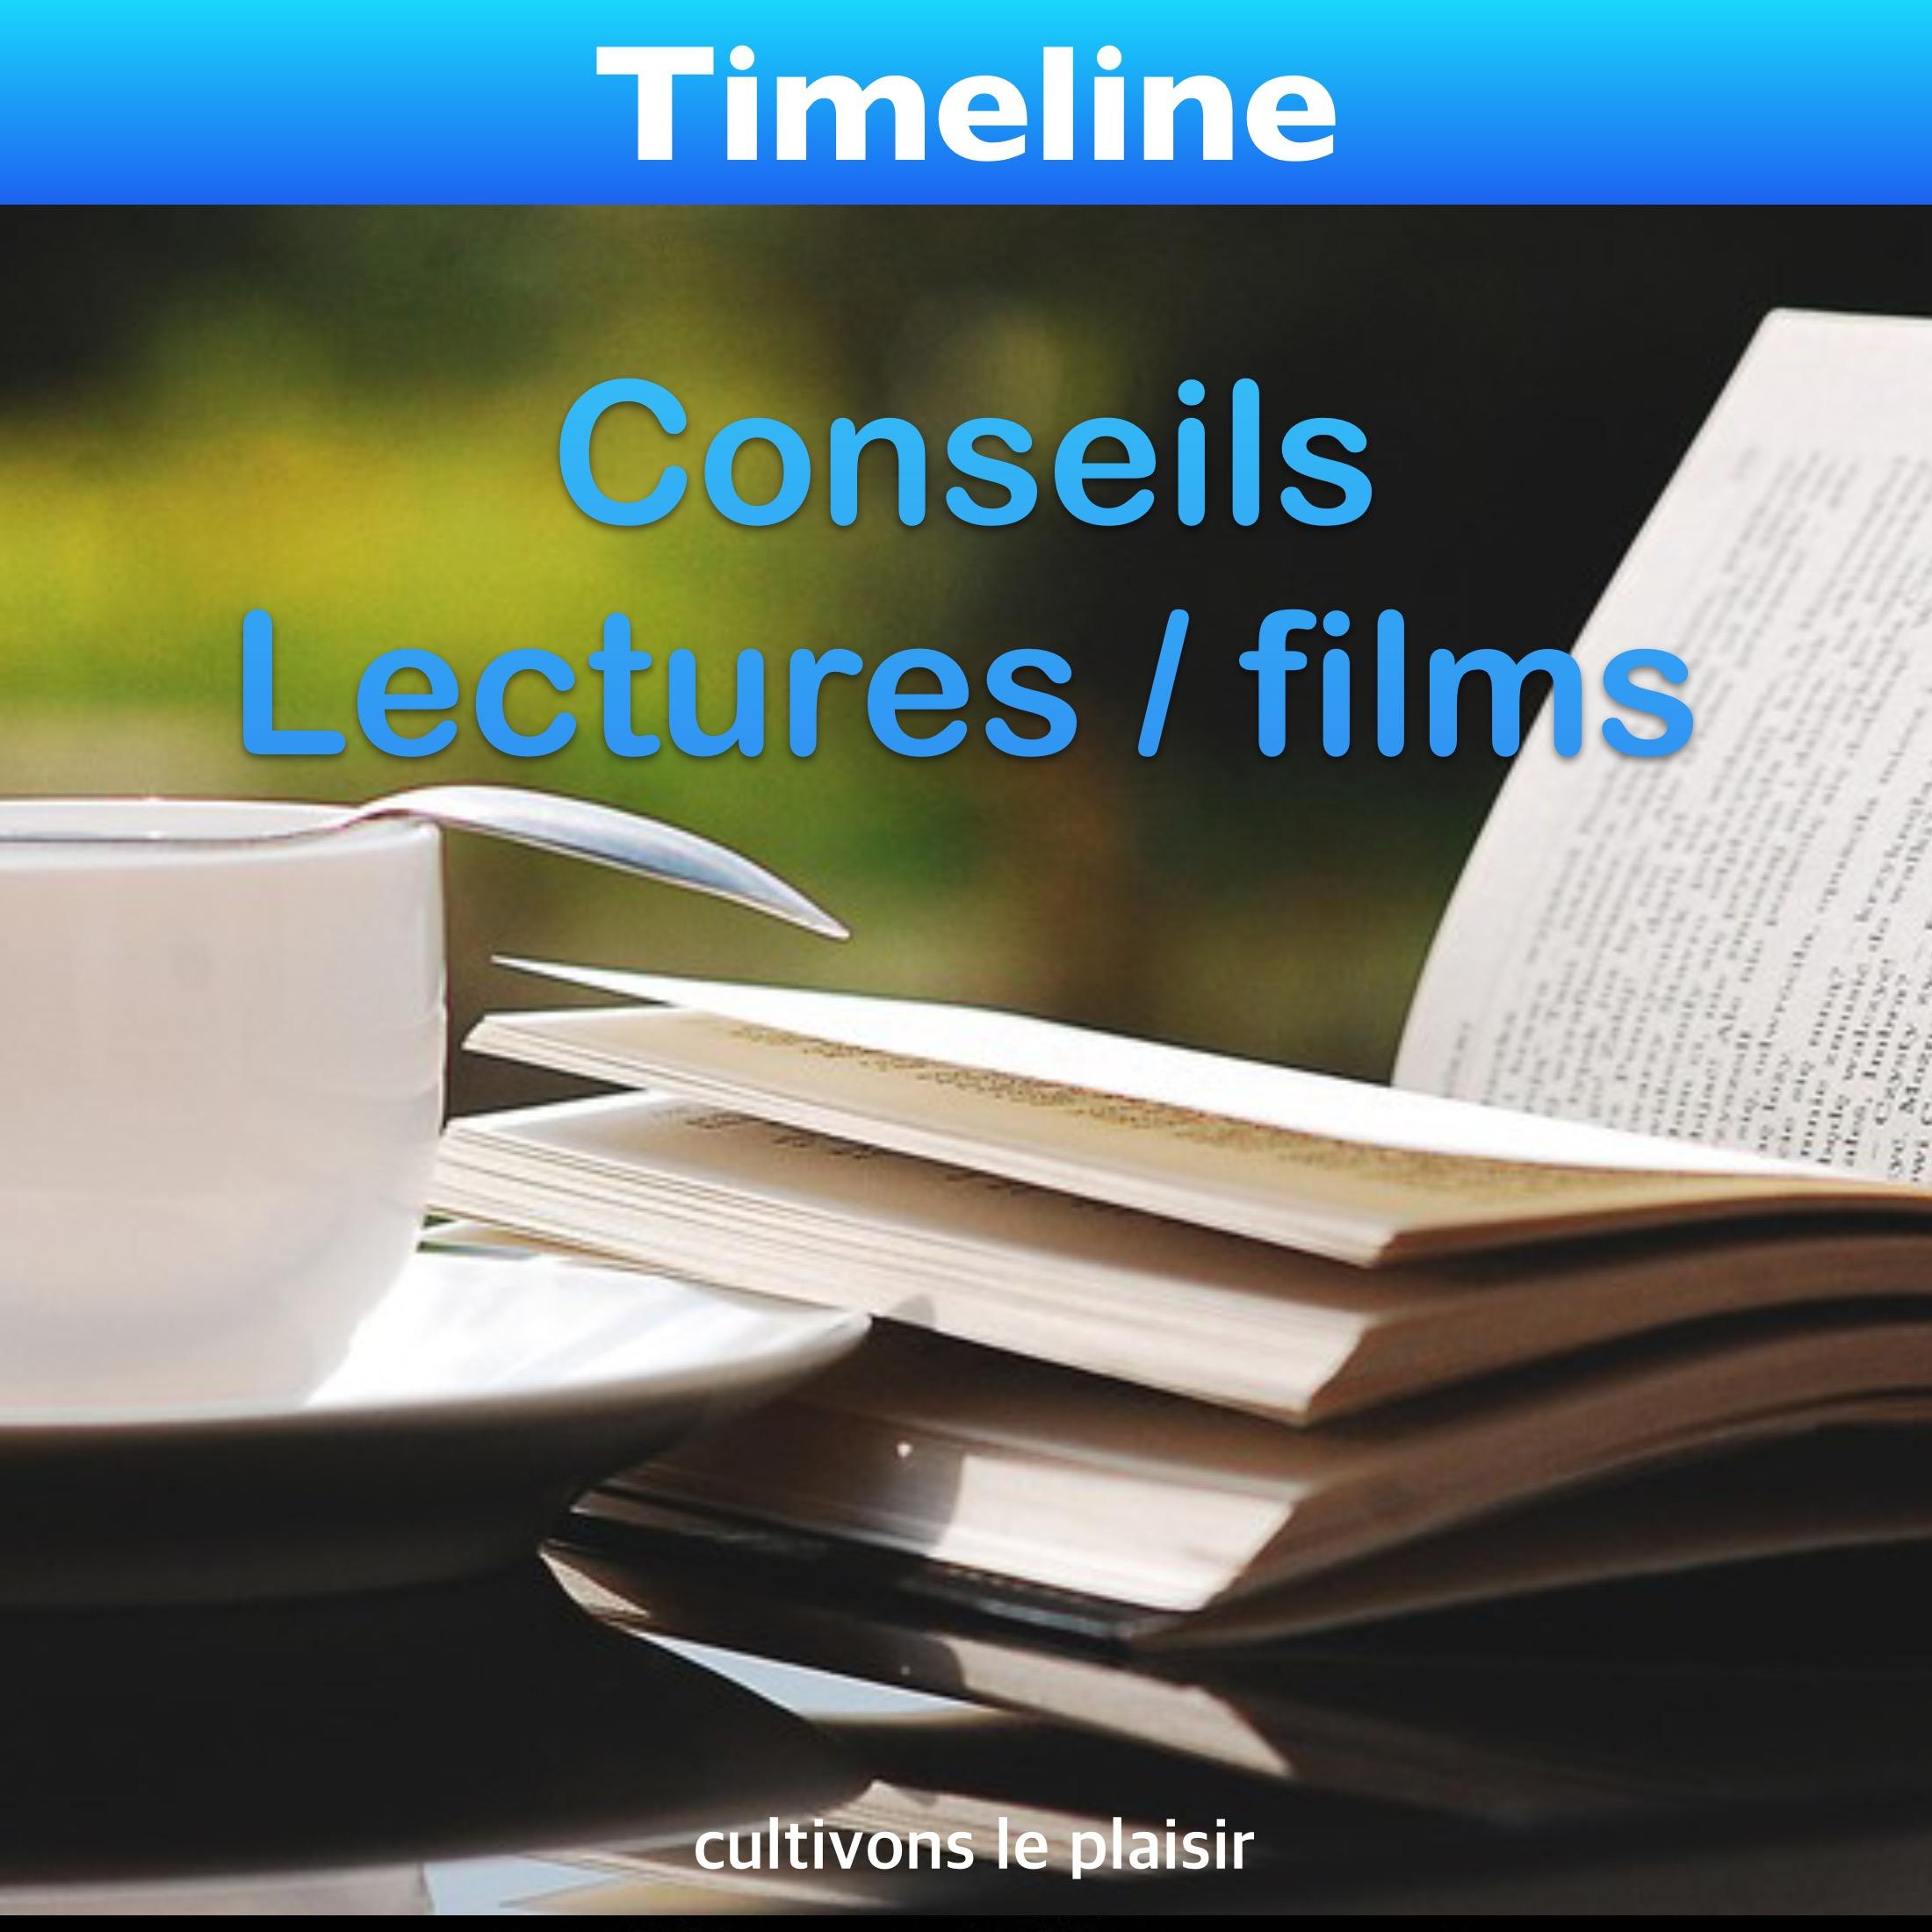 Conseils lectures et film